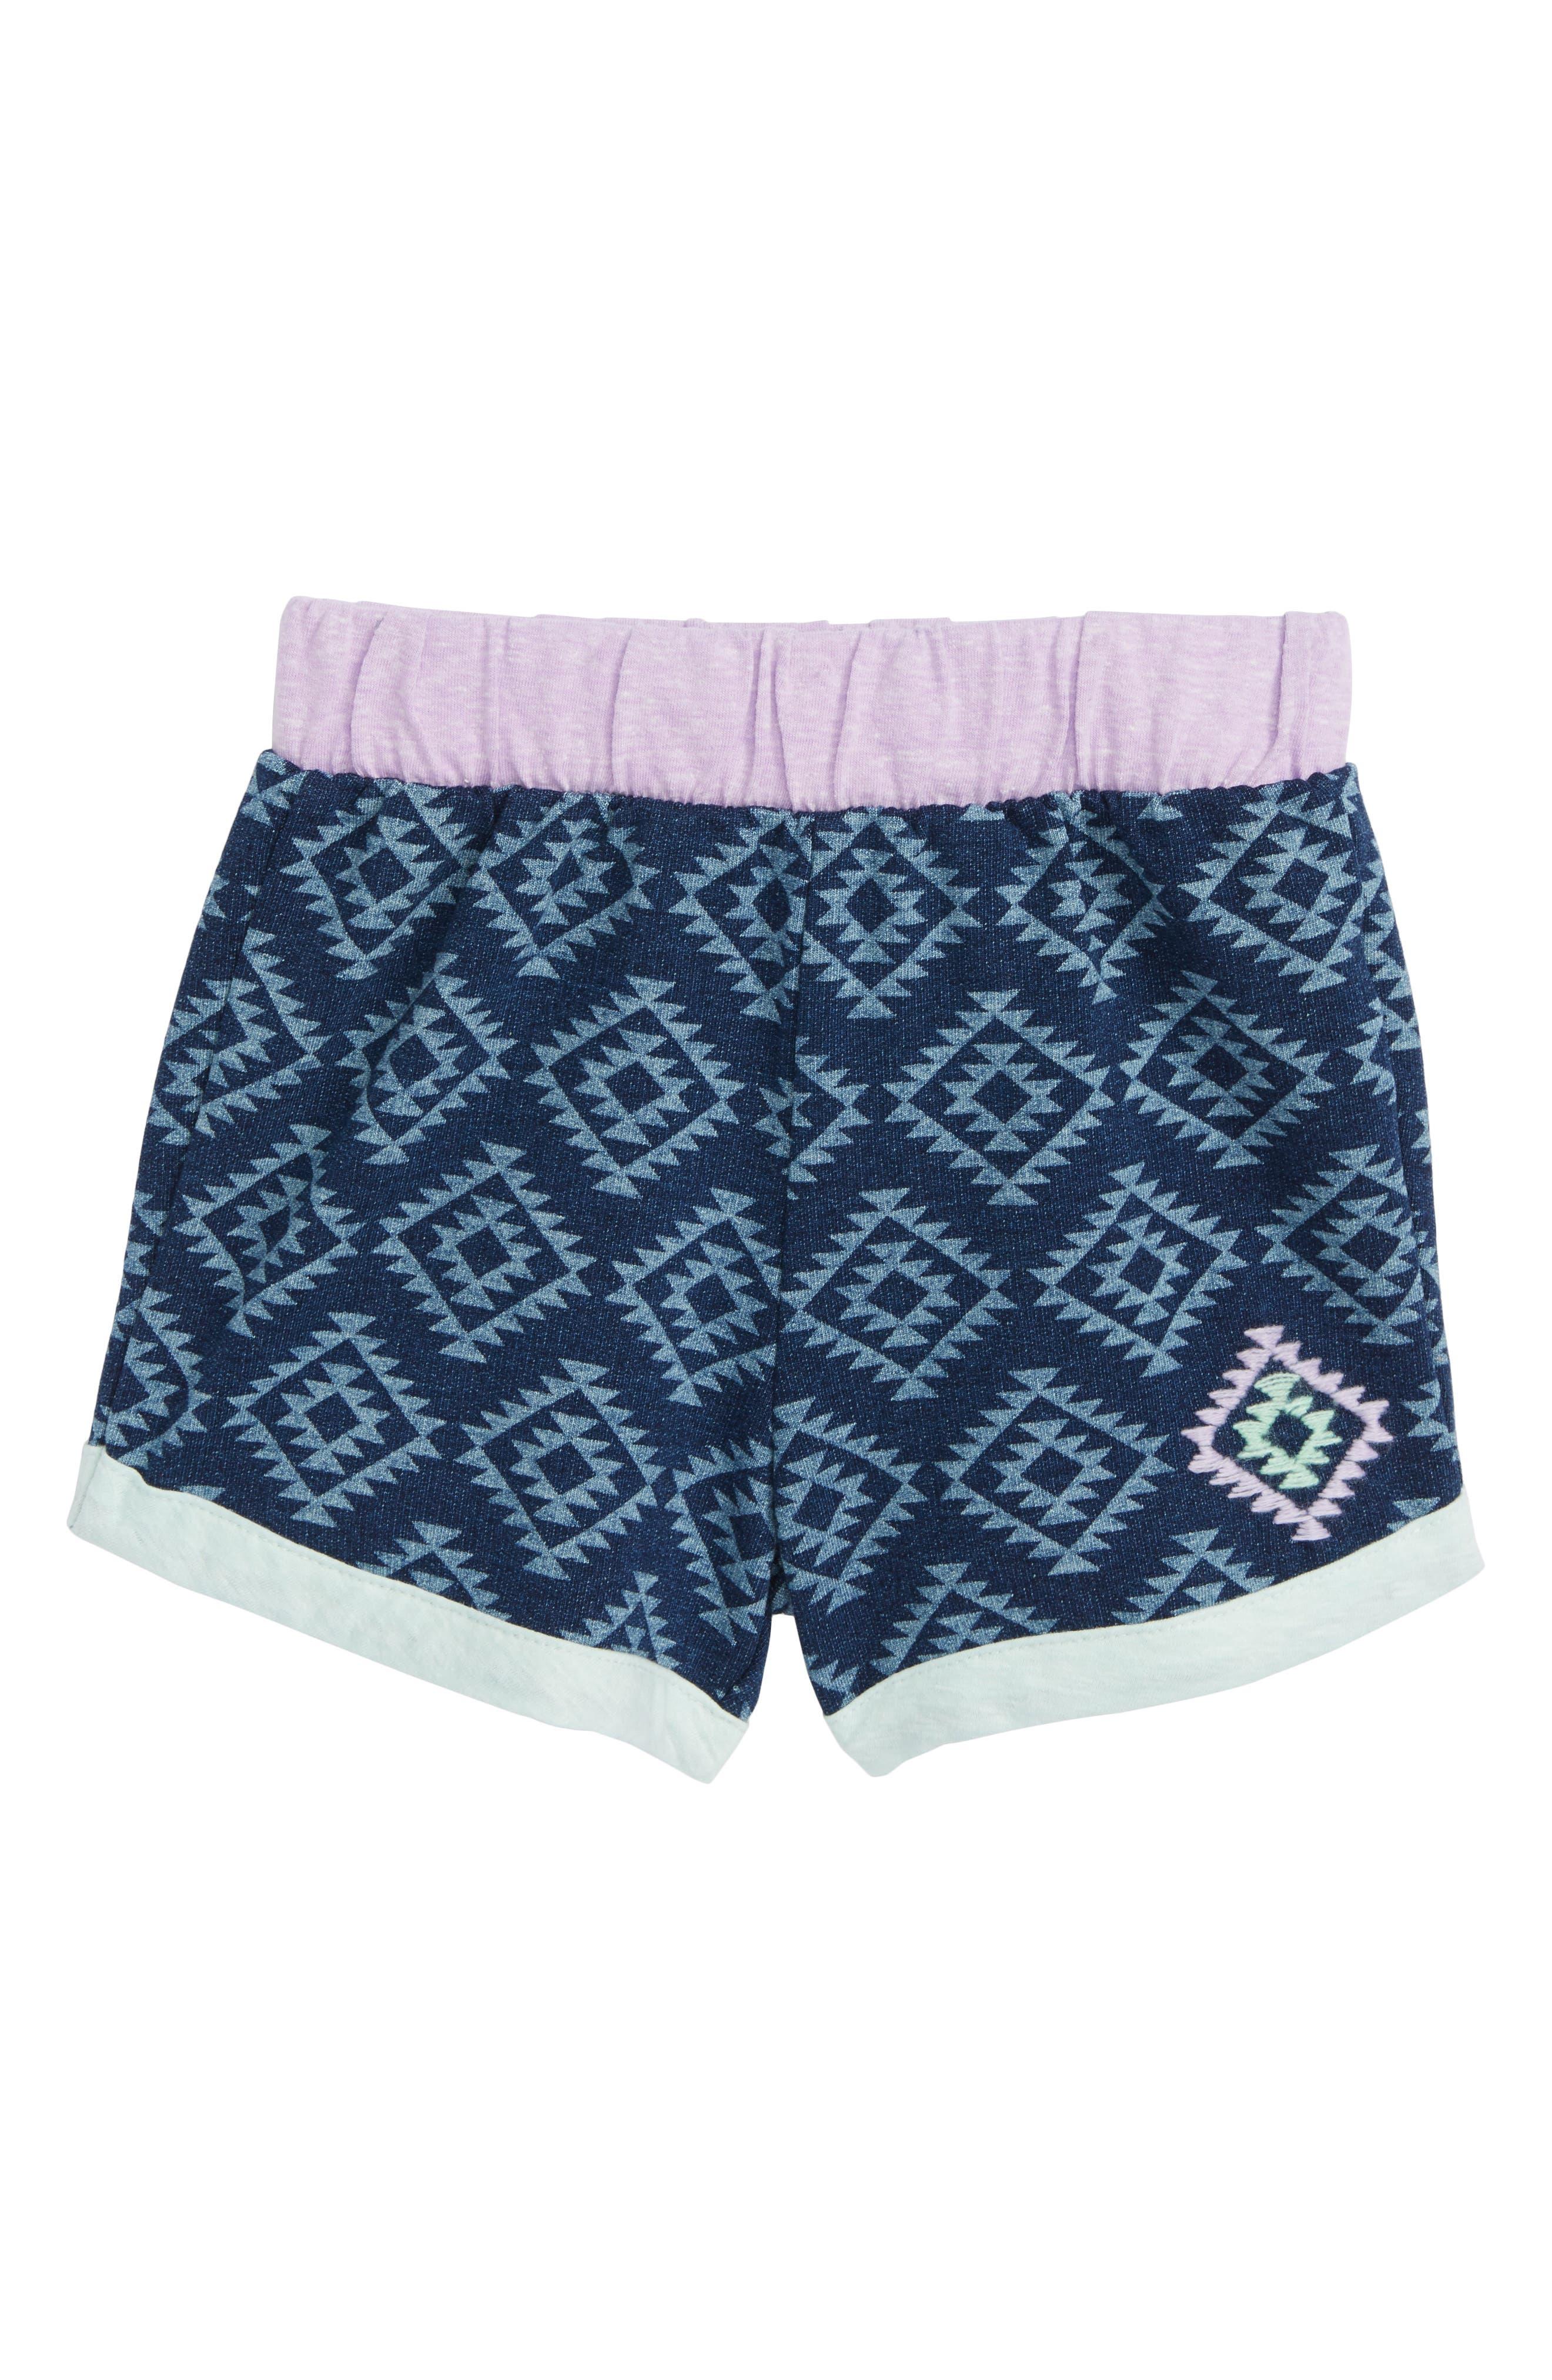 Miki Miette Camilla Print Shorts (Toddler Girls & Little Girls)